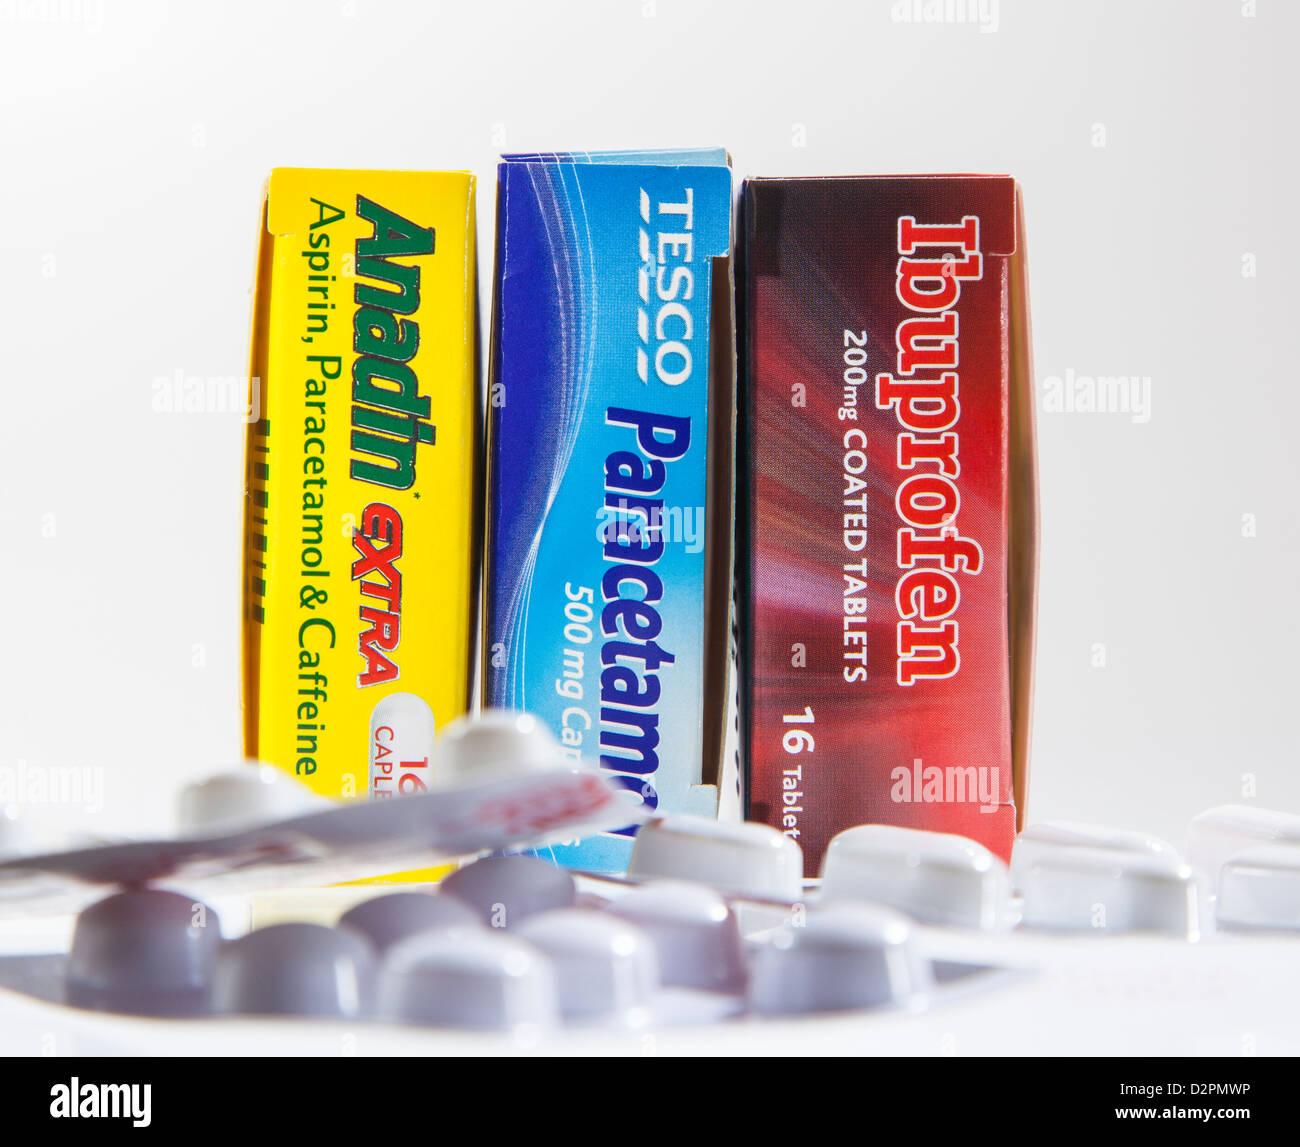 Ibuprofen And Aspirin